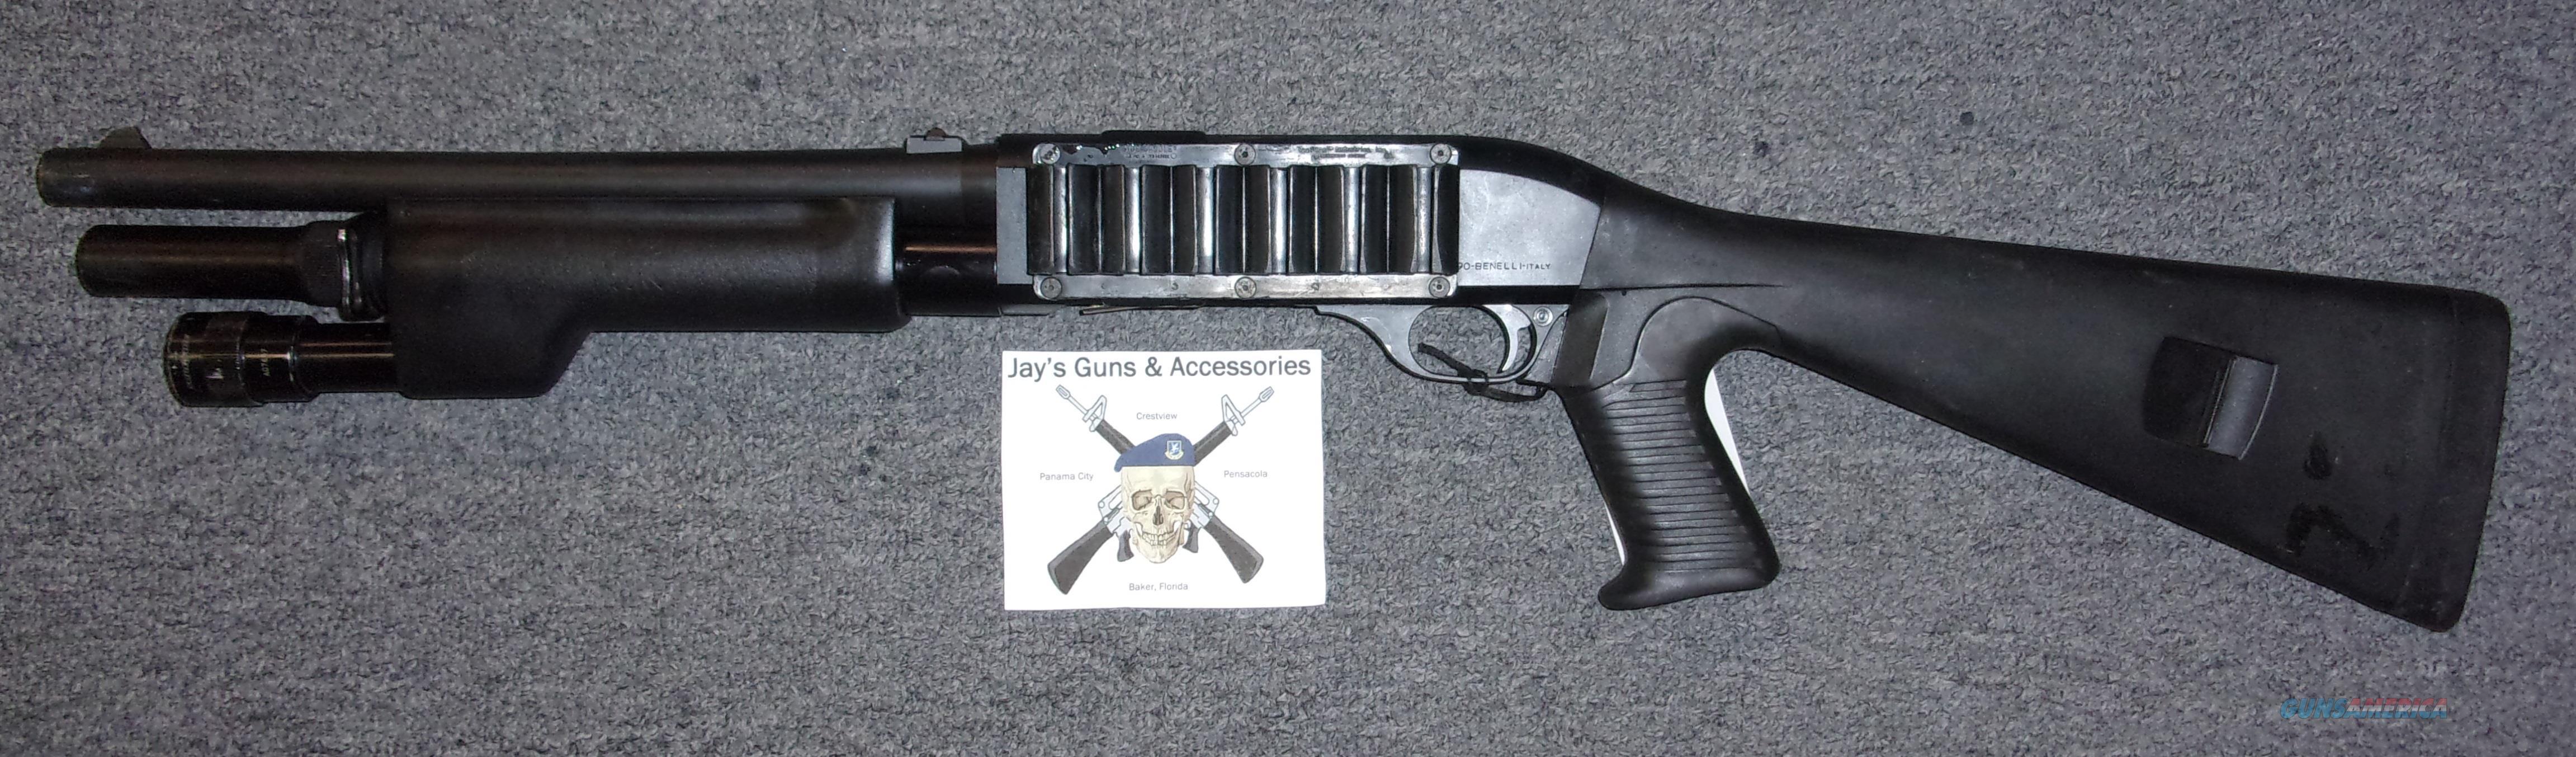 Benelli M1 Super 90 (11247)/NFA Item  Guns > Shotguns > Benelli Shotguns > Tactical